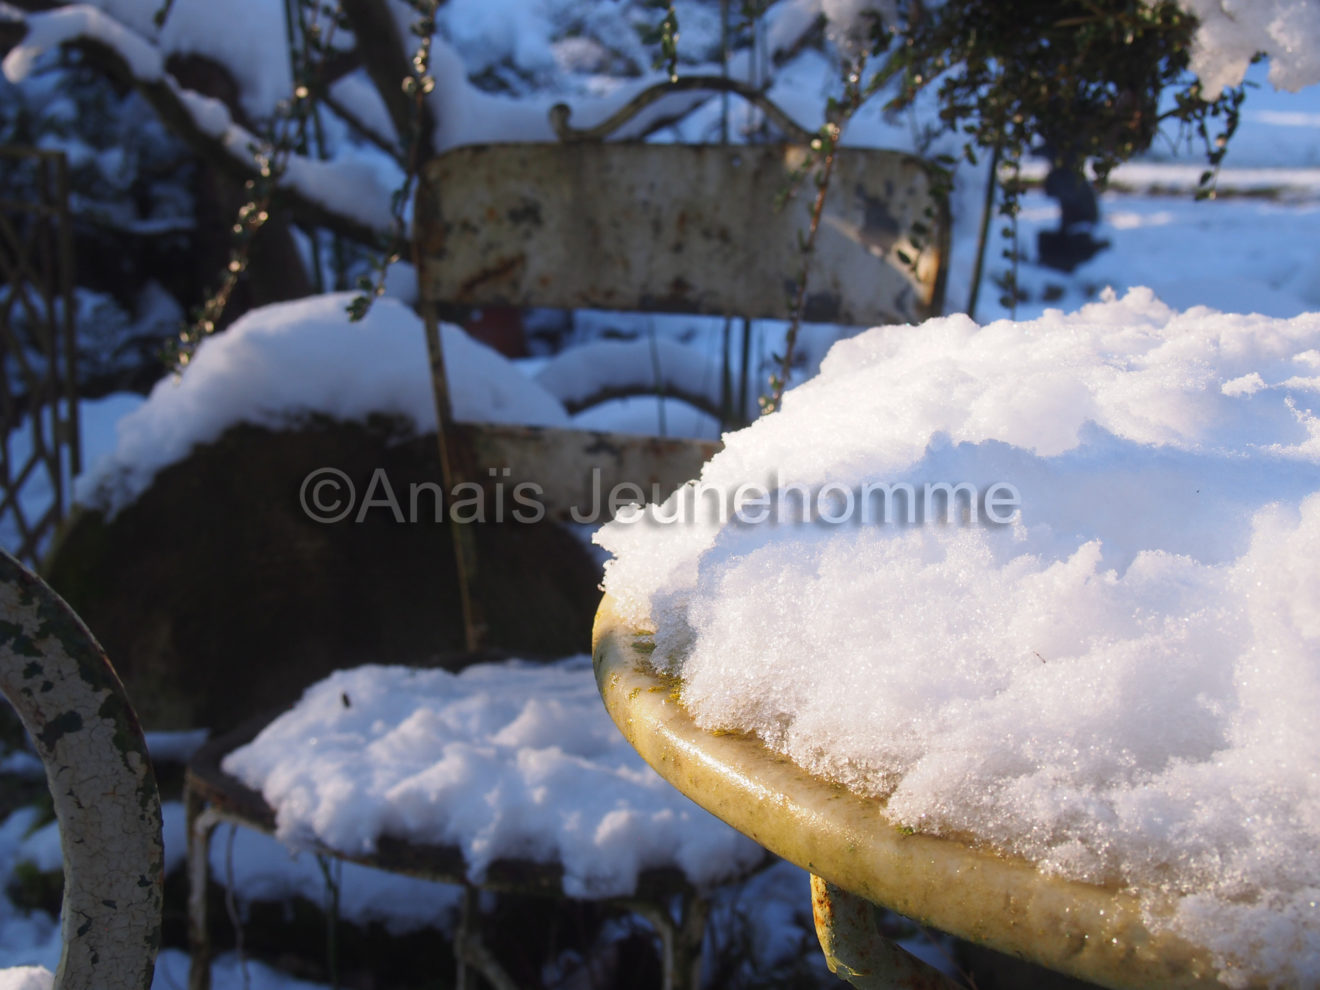 Dînette neigeuse